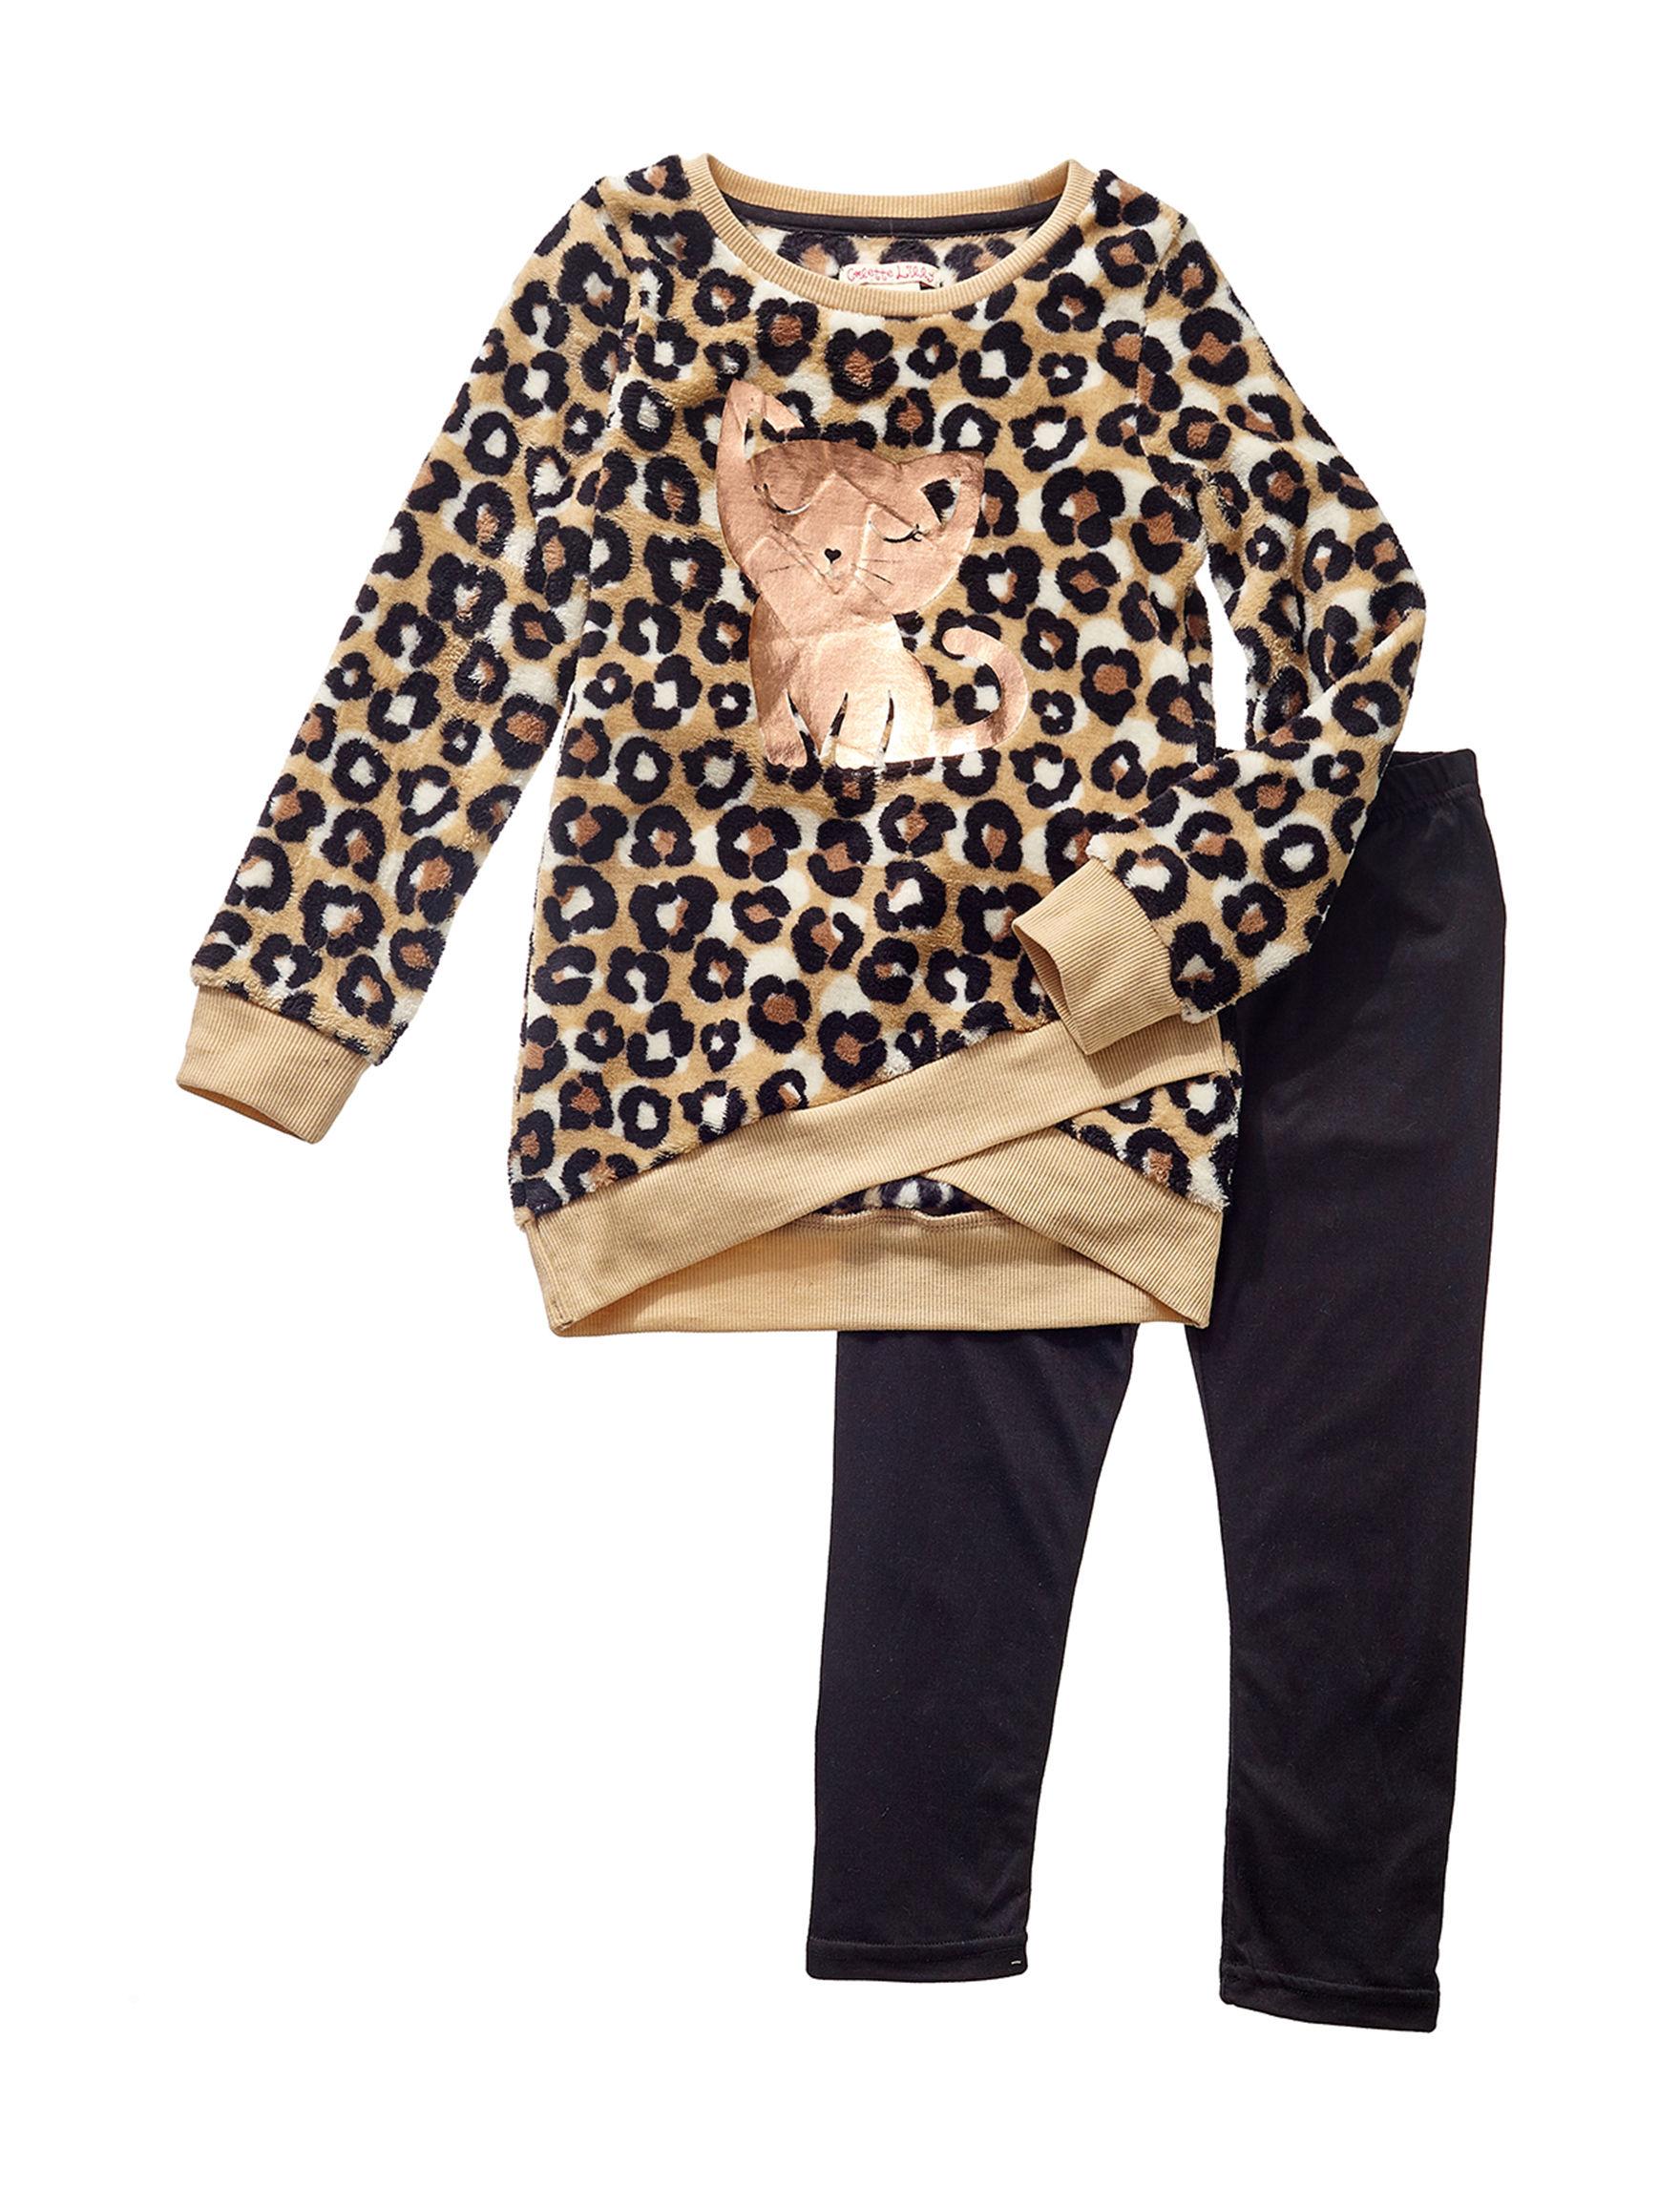 Specialty Girl Leopard / Black